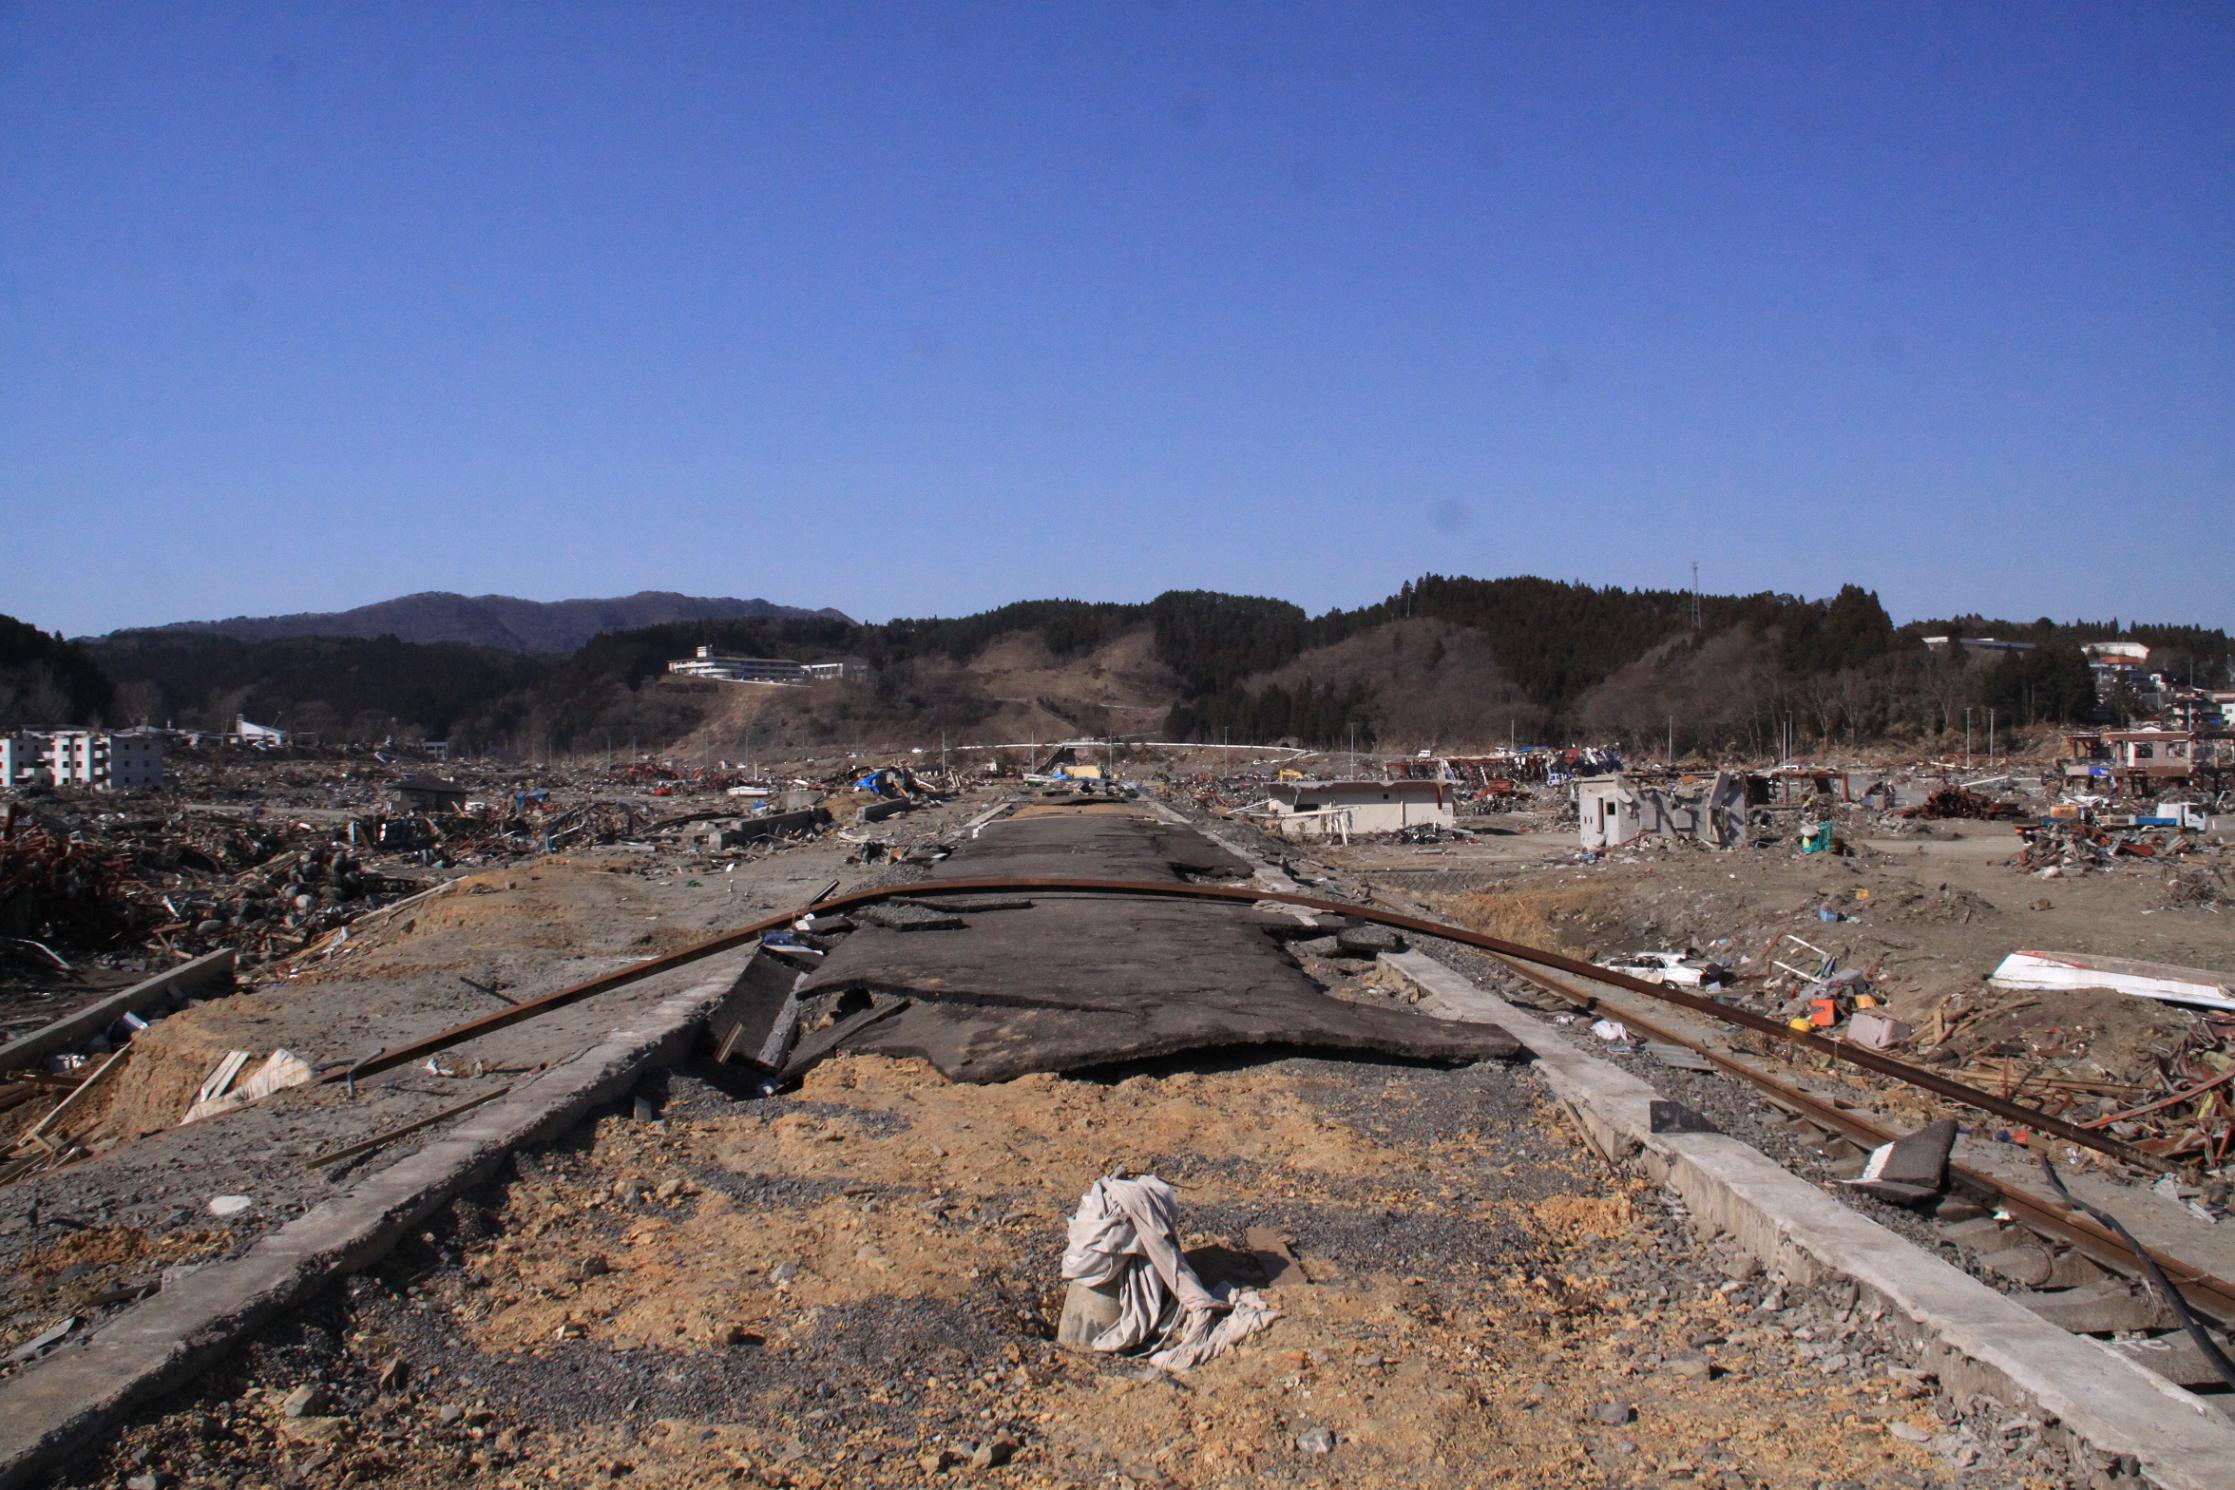 Shizugawa_Station_platform_after_Tsunami.jpg